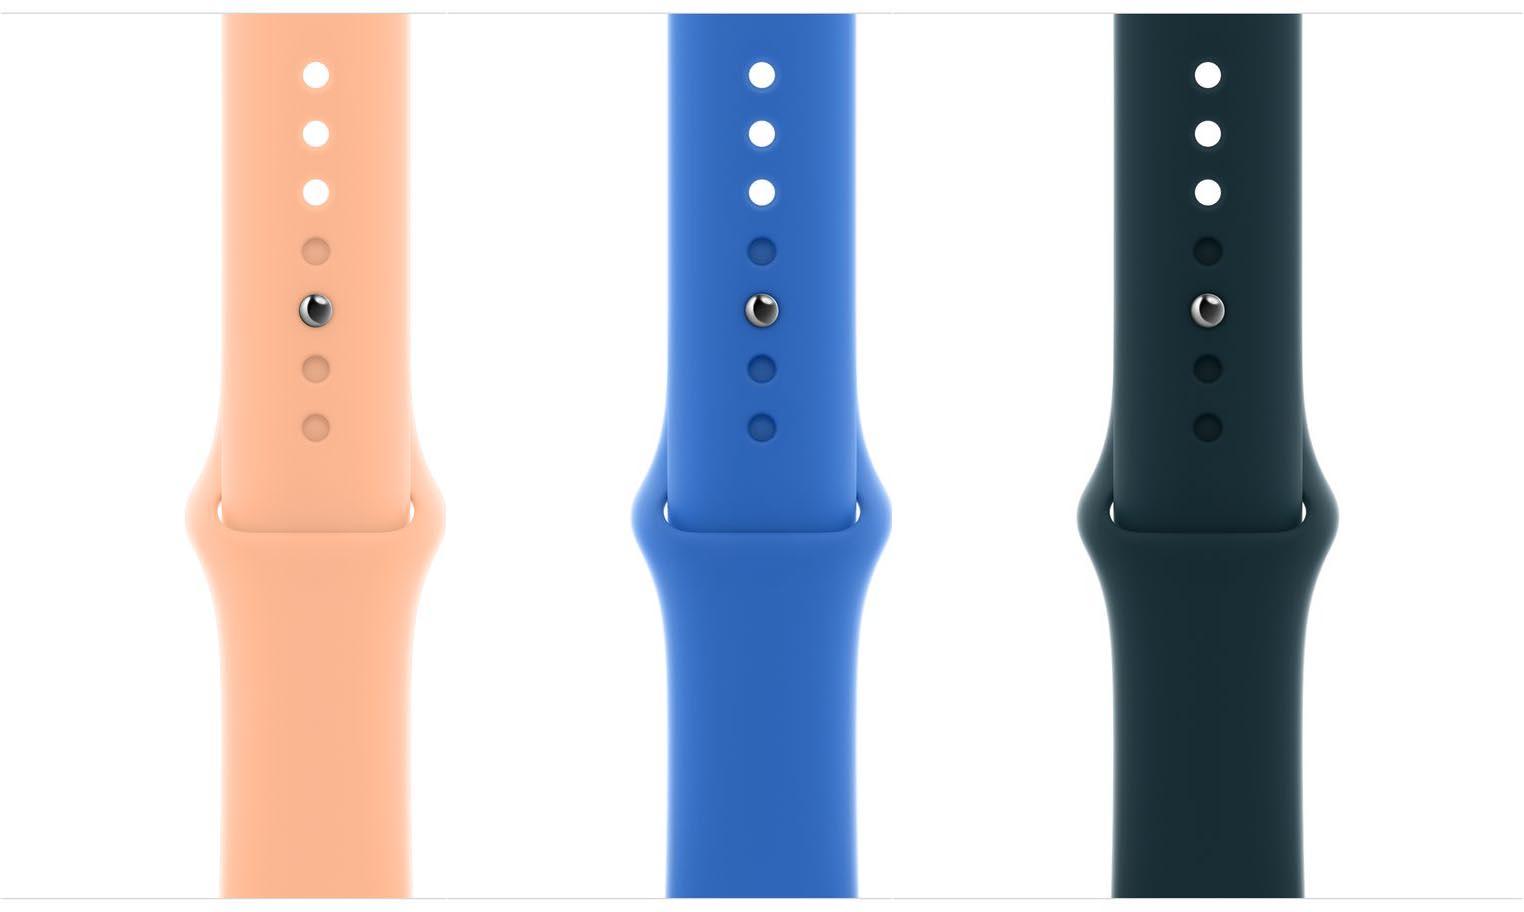 Bracelets Apple Watch printemps 2021